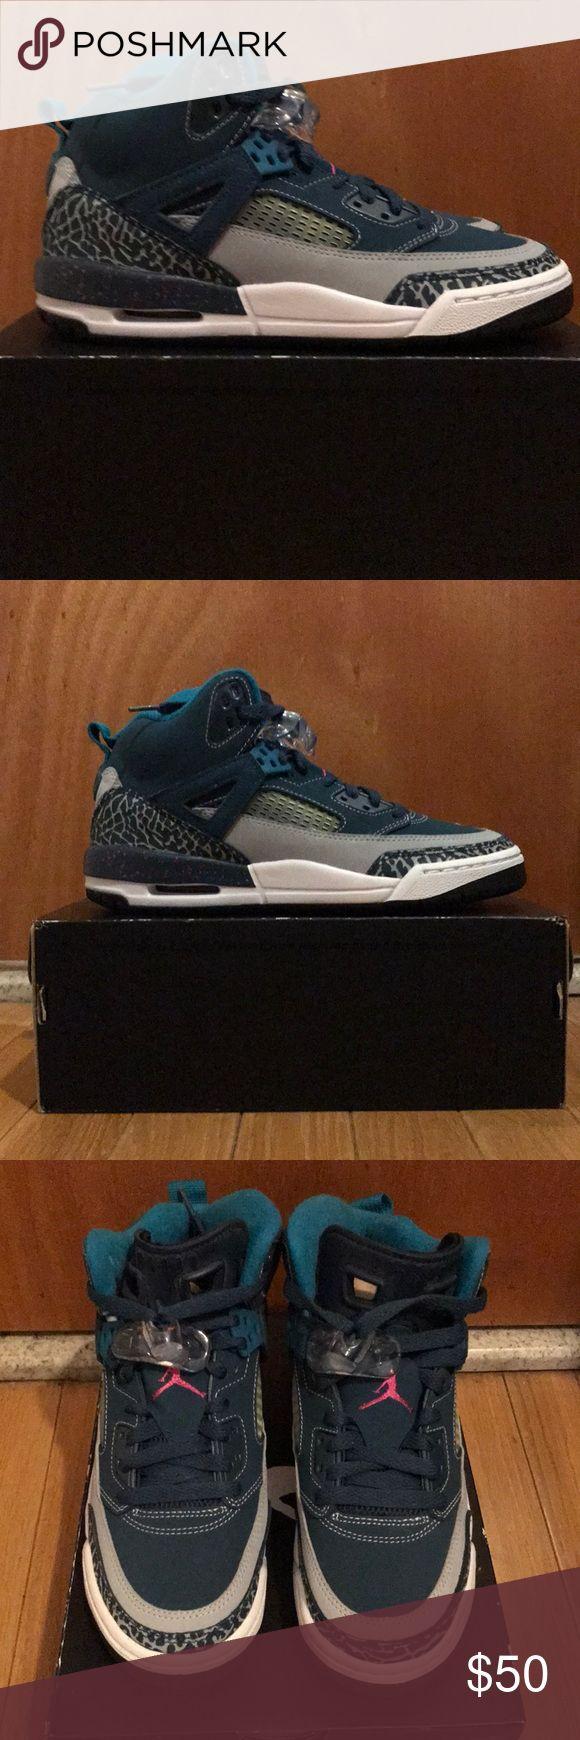 Jordan Spizike Sneakers- Brand new, never worn! Jordan Youth Spizike Sneakers. Space blue/wolf grey/fusion pink. Never worn, brand new. Air Jordan Shoes Sneakers